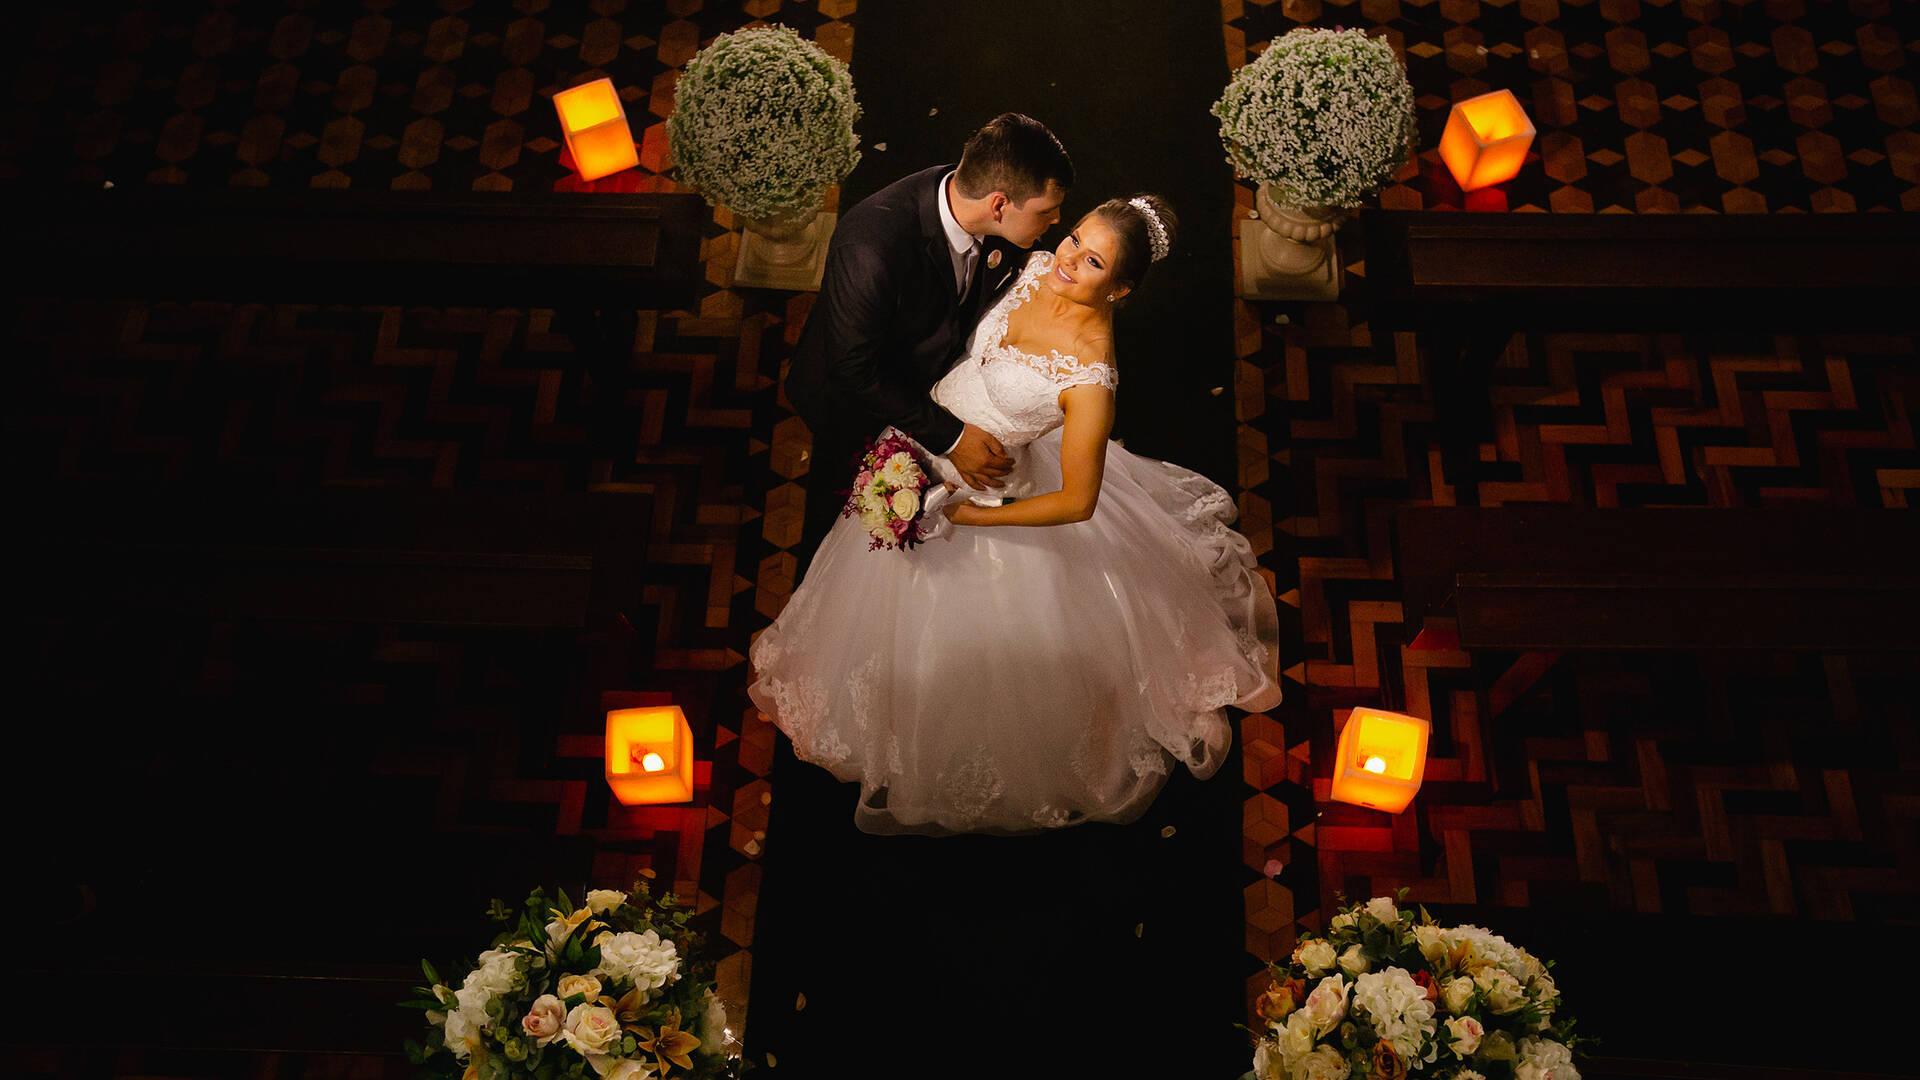 Fotografia de Casamento de Kelin e Alan